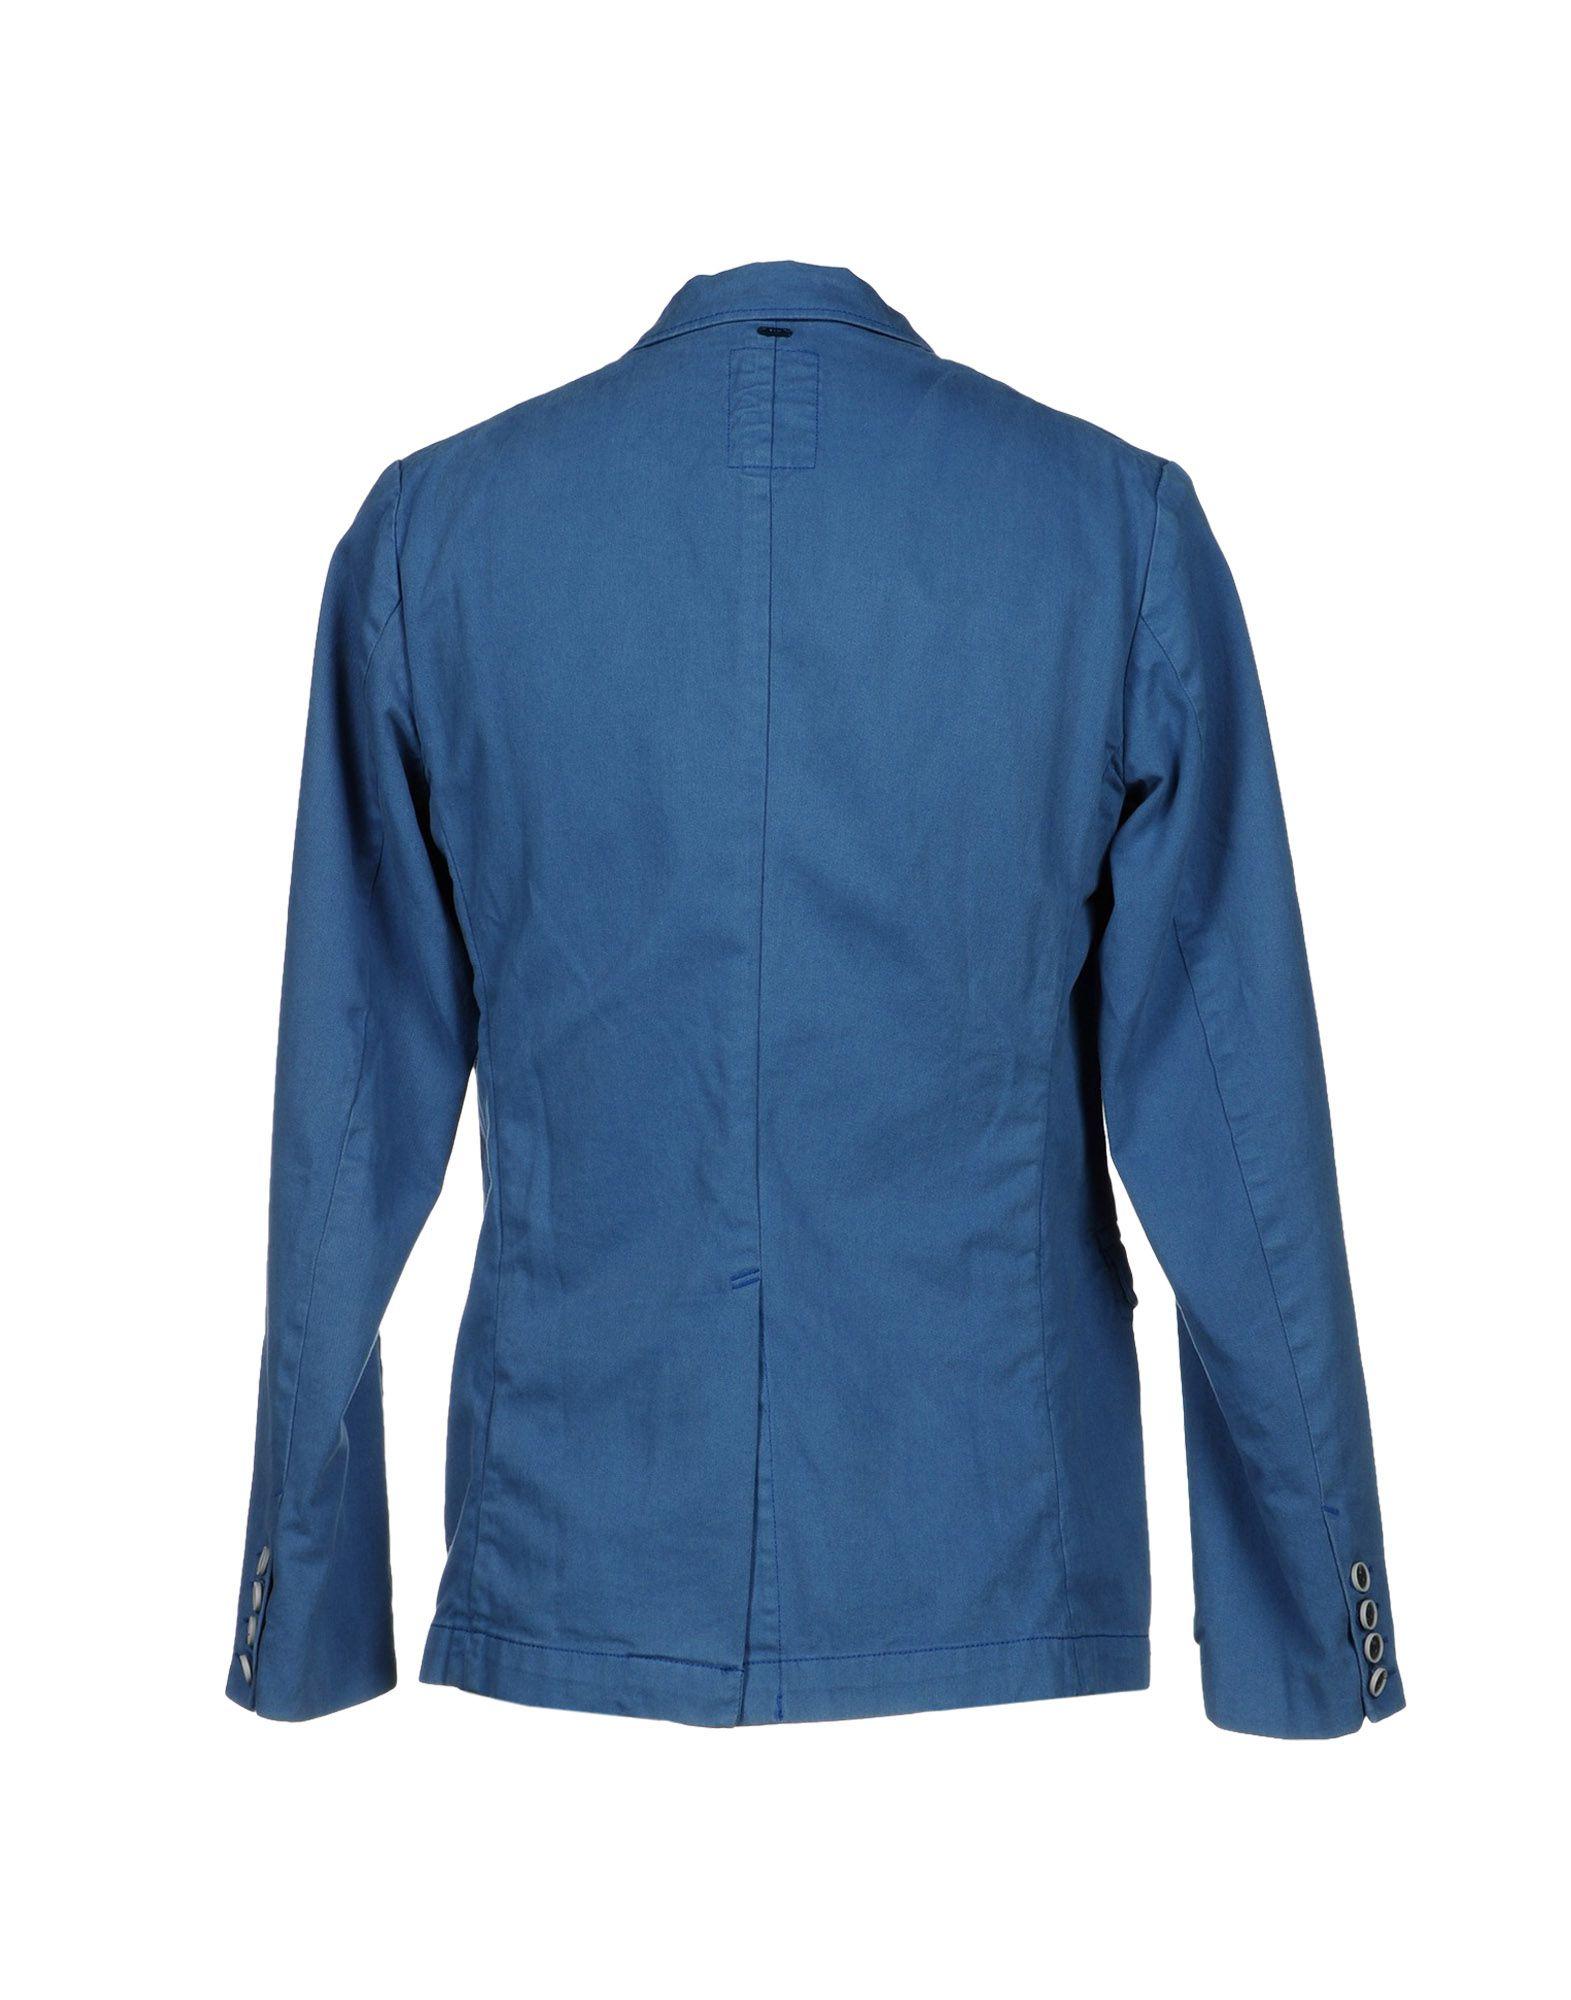 blue star clothing co - photo #35